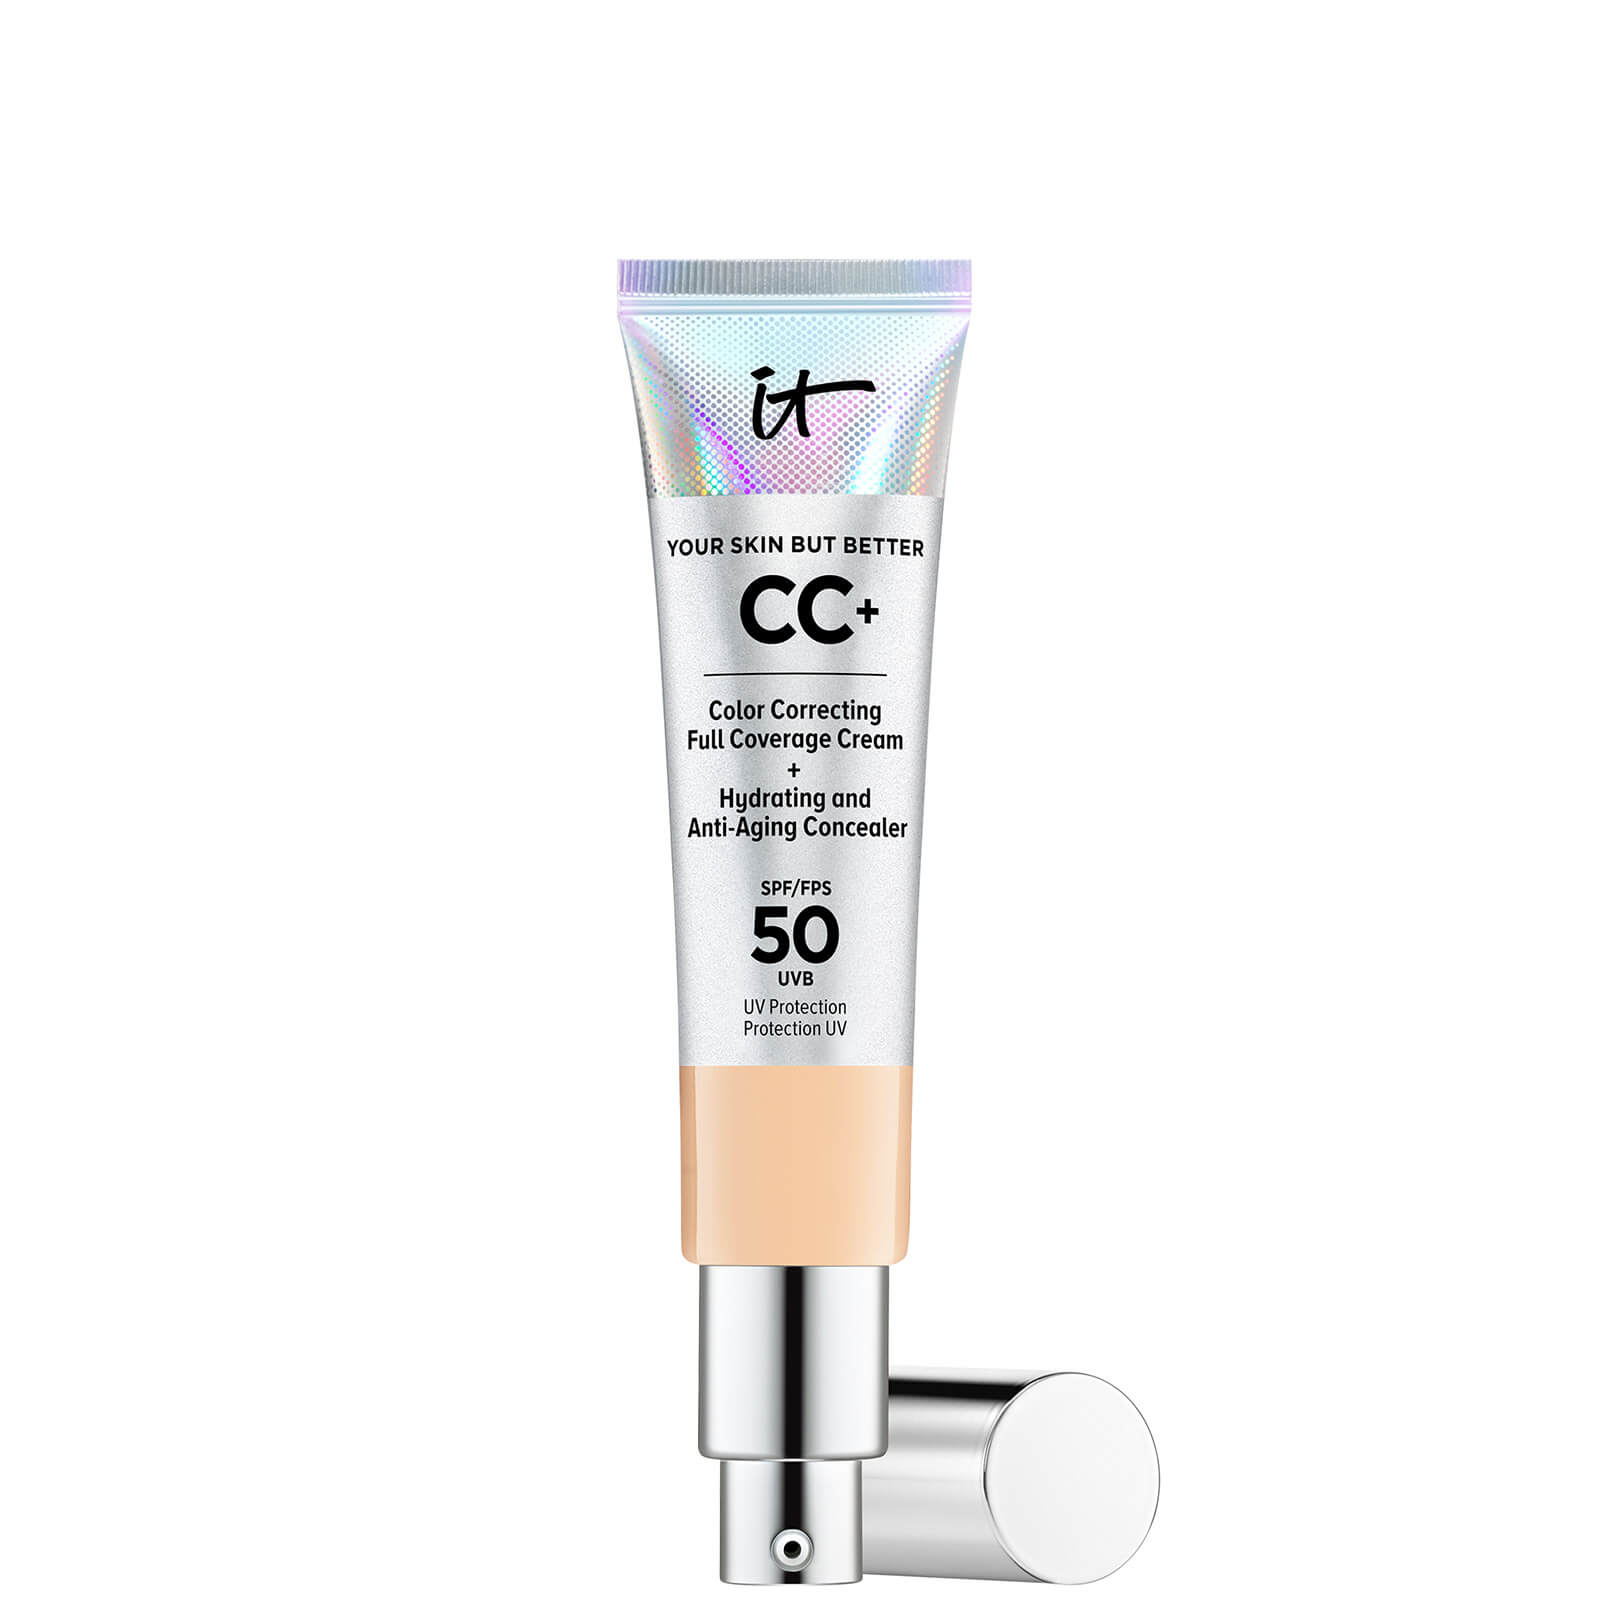 Купить IT Cosmetics Your Skin But Better CC+ Cream with SPF50 32ml (Various Shades) - Light Medium